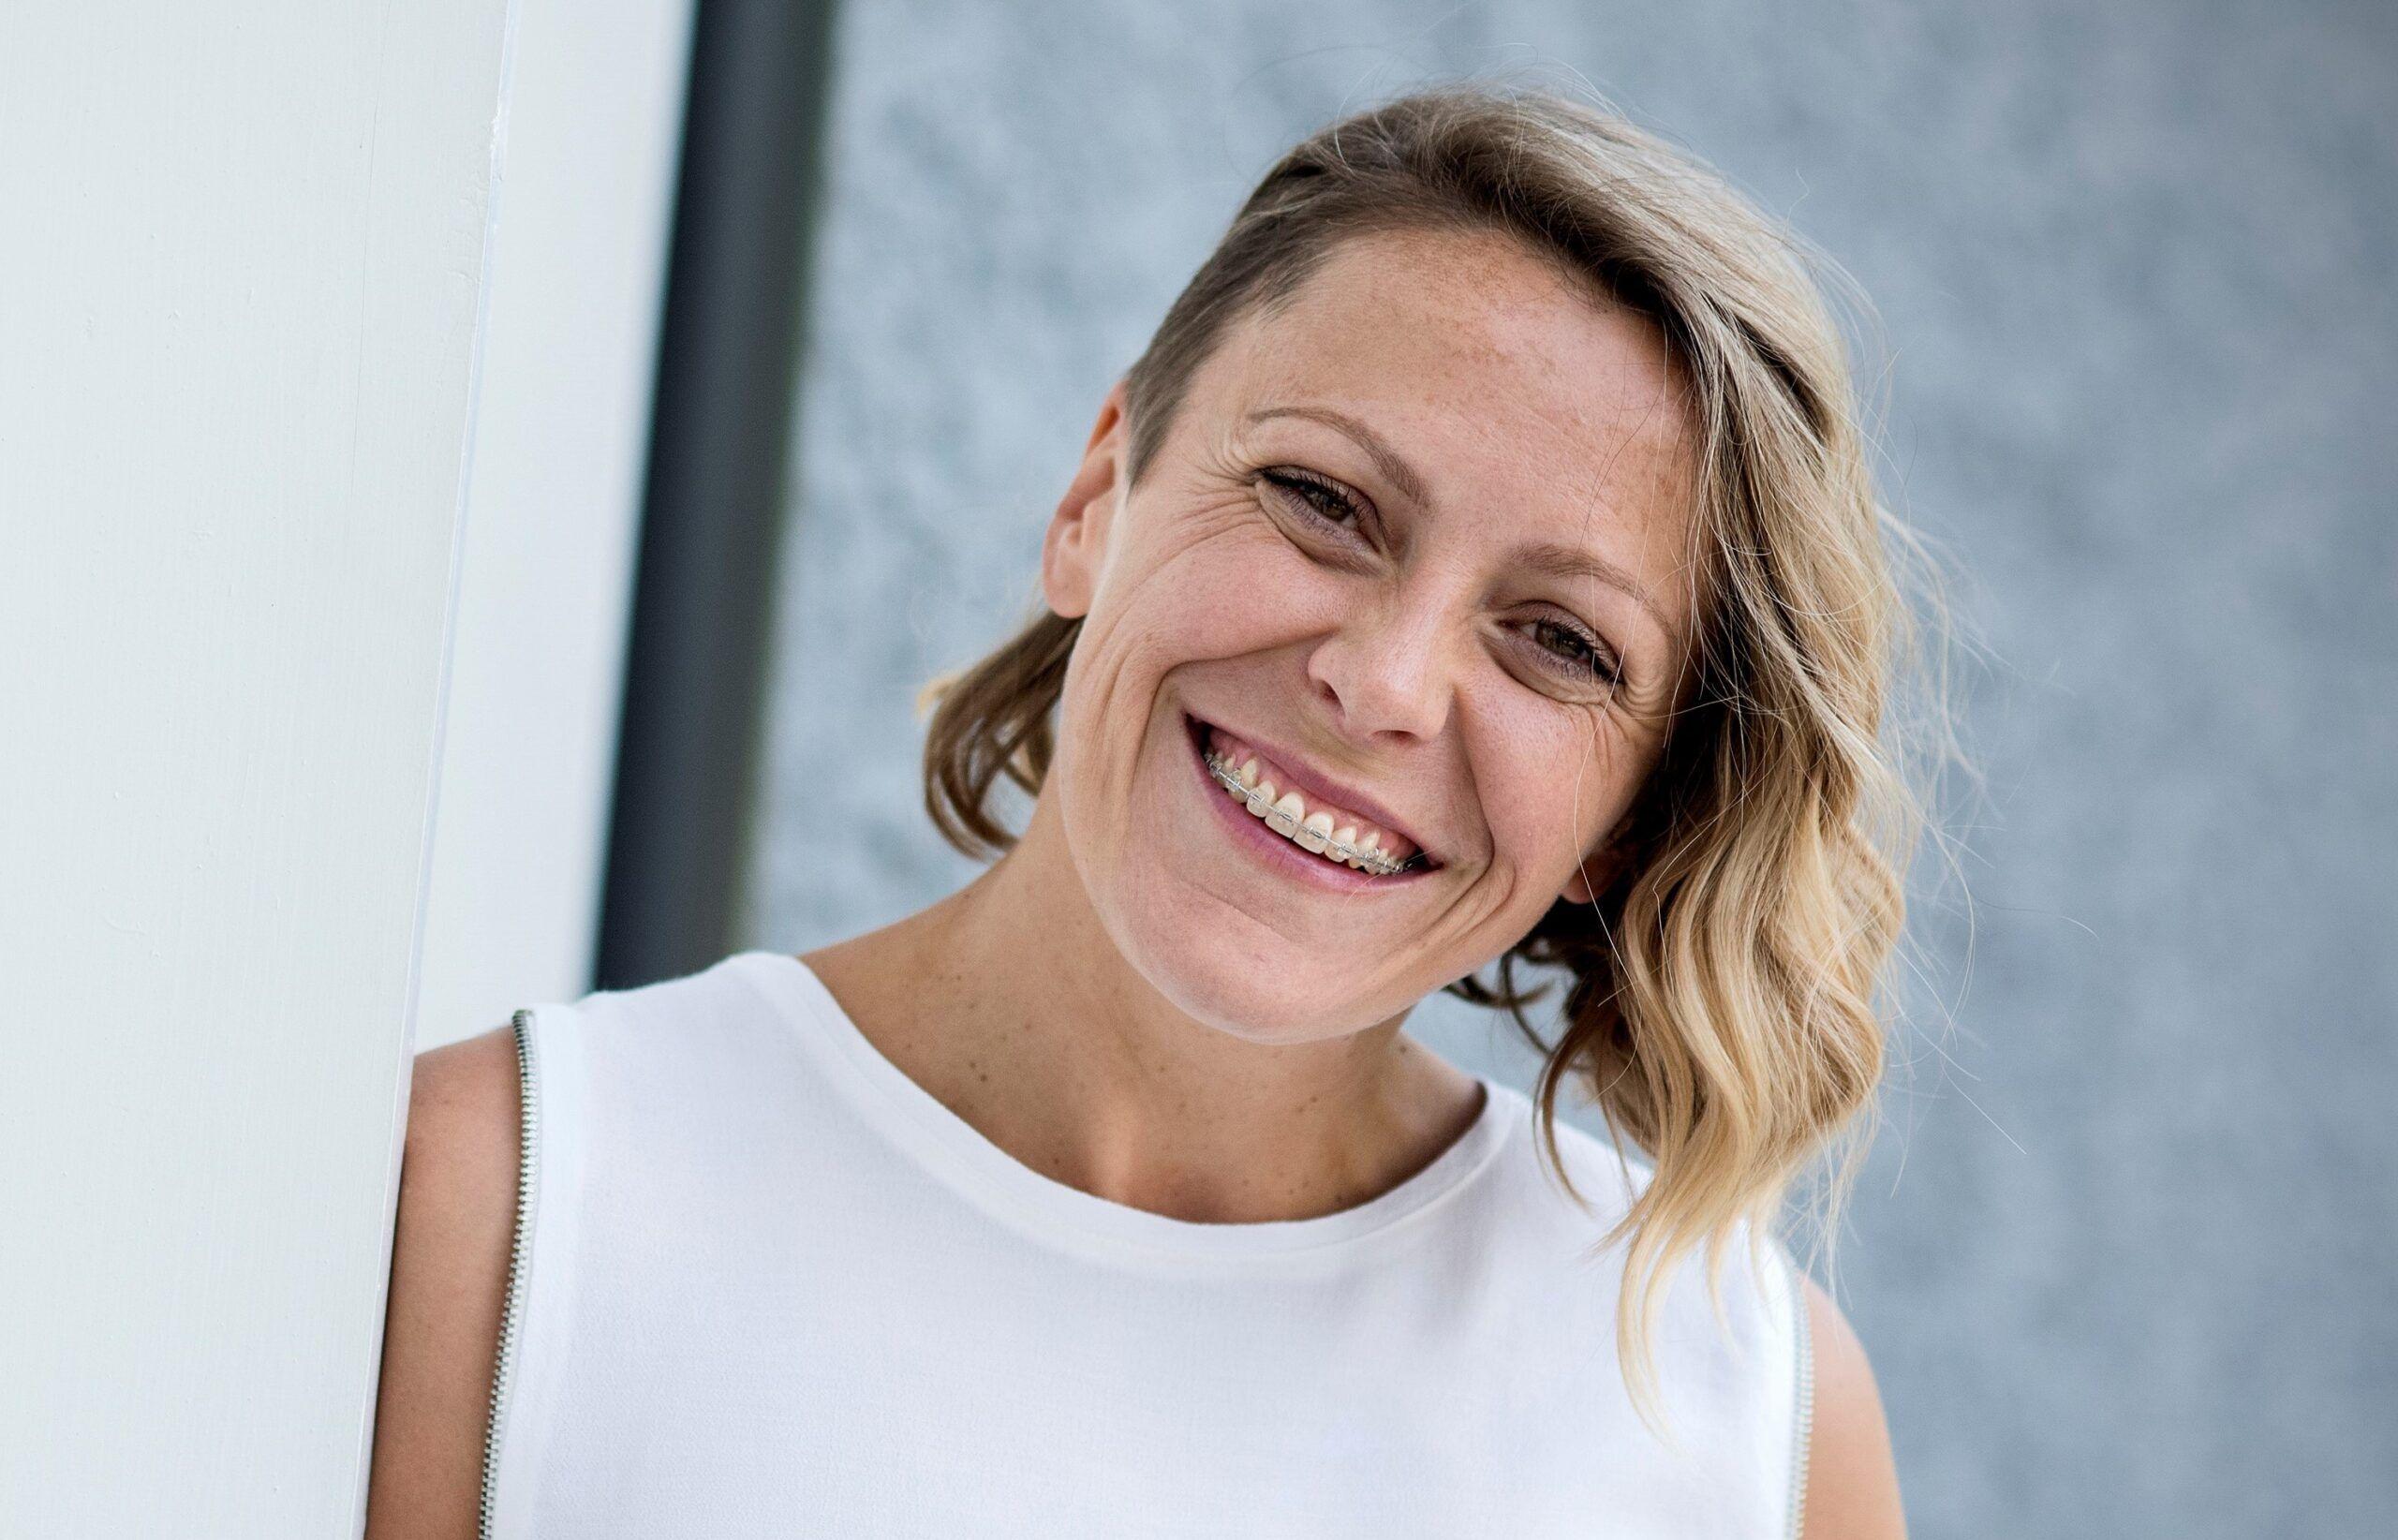 Maja Šimleša: Želim da djecu priča dirne, da im ideje poput samopouzdanja, prihvaćanja, hrabrosti, upornosti ili življenja snova suptilno uđu pod kožu, ali bez moraliziranja i patroniziranja